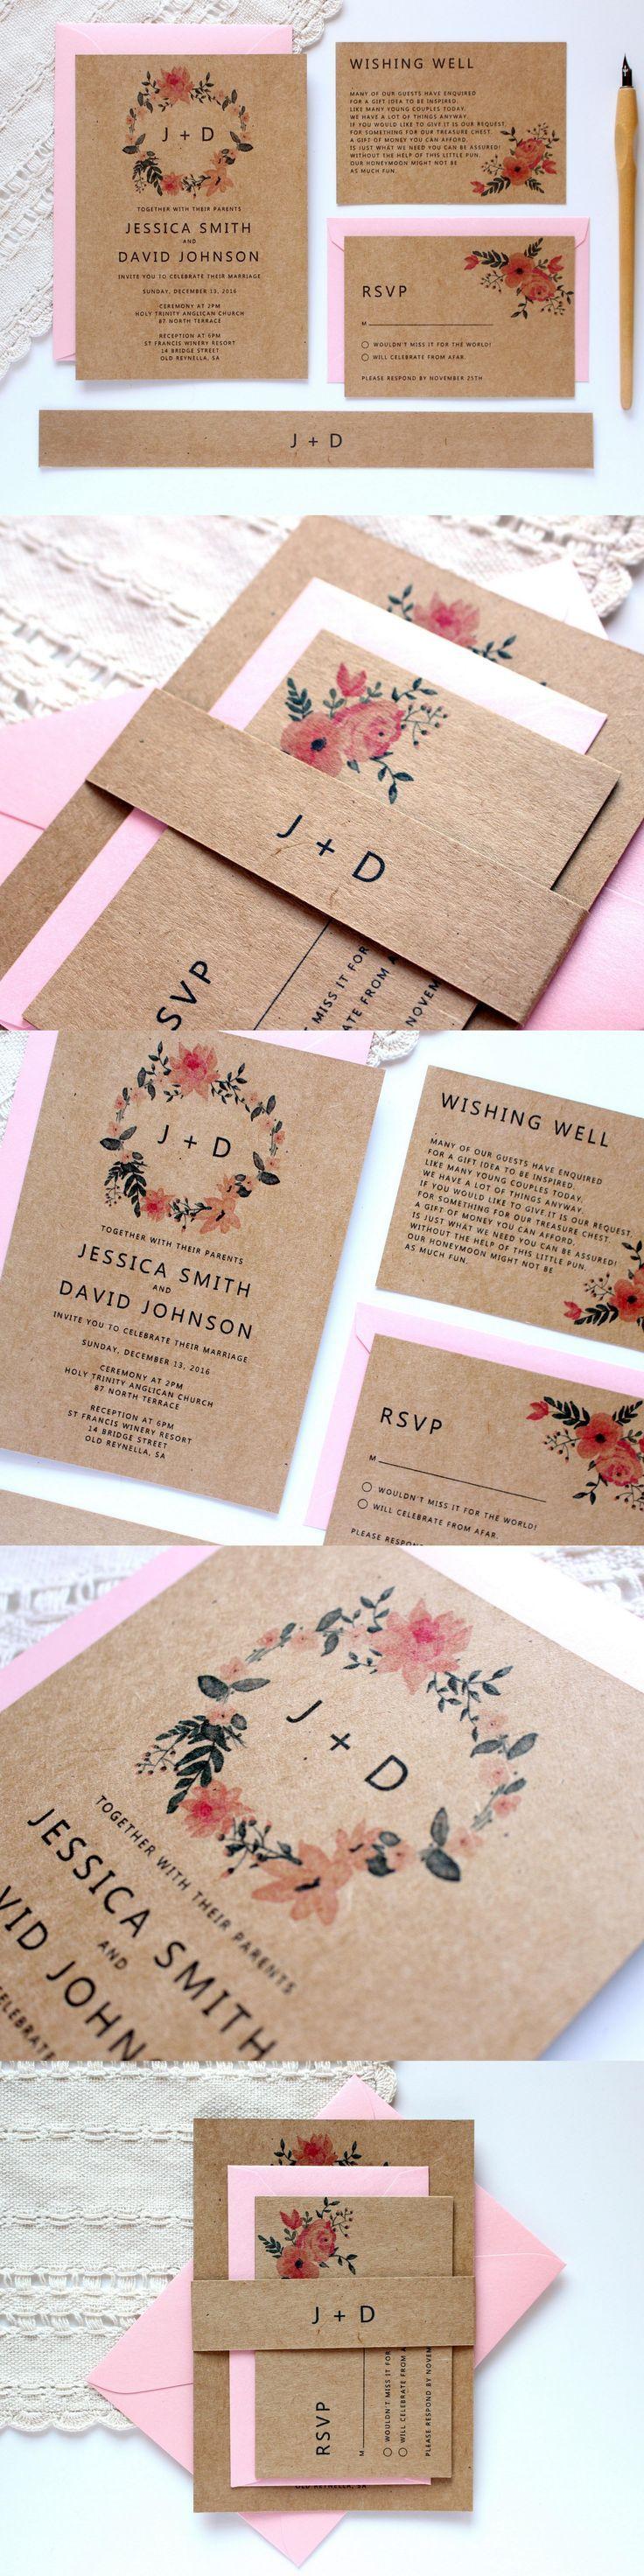 Kraft wedding invitation with pink floral wreath